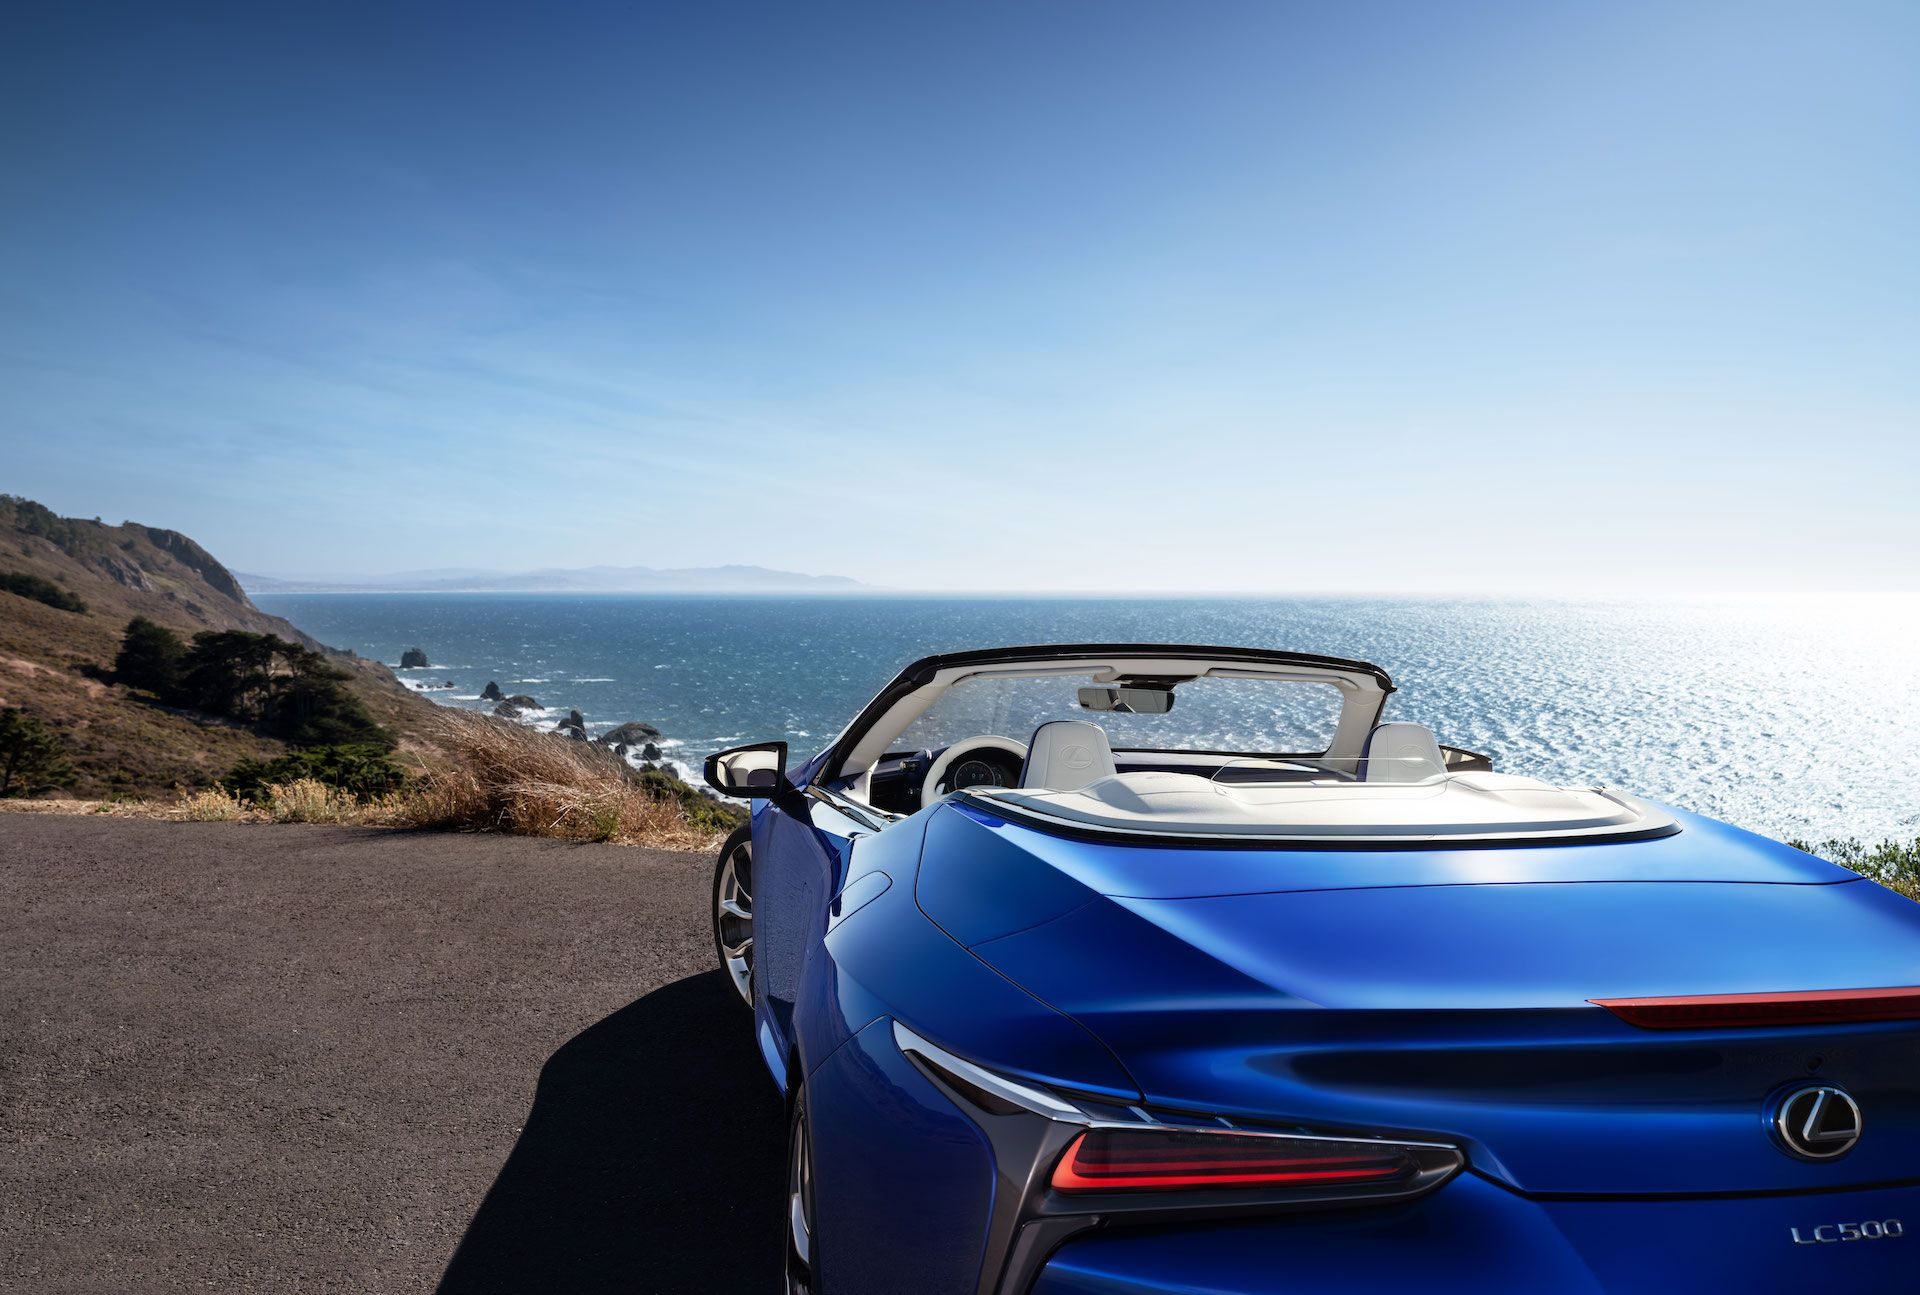 2021 Lexus Lc 500 Convertible Is A Gorgeous V 8 Drop Top Lexus Maserati Granturismo Convertible